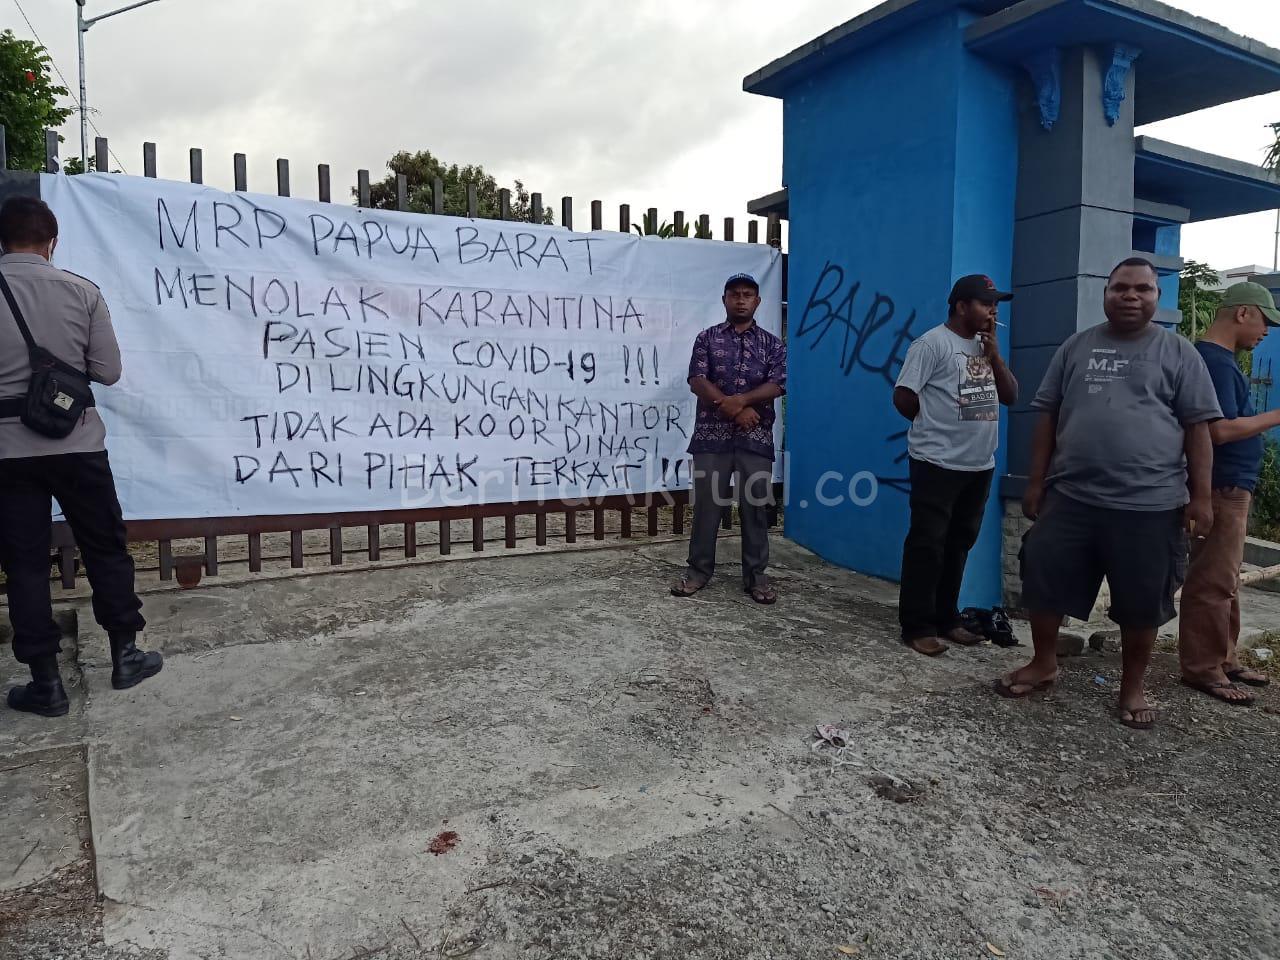 Hendak Diisolasi di Kantor Balai UMKM, Warga Manokwari Tolak 2 Pasien COVID-19 3 IMG 20200417 WA0029